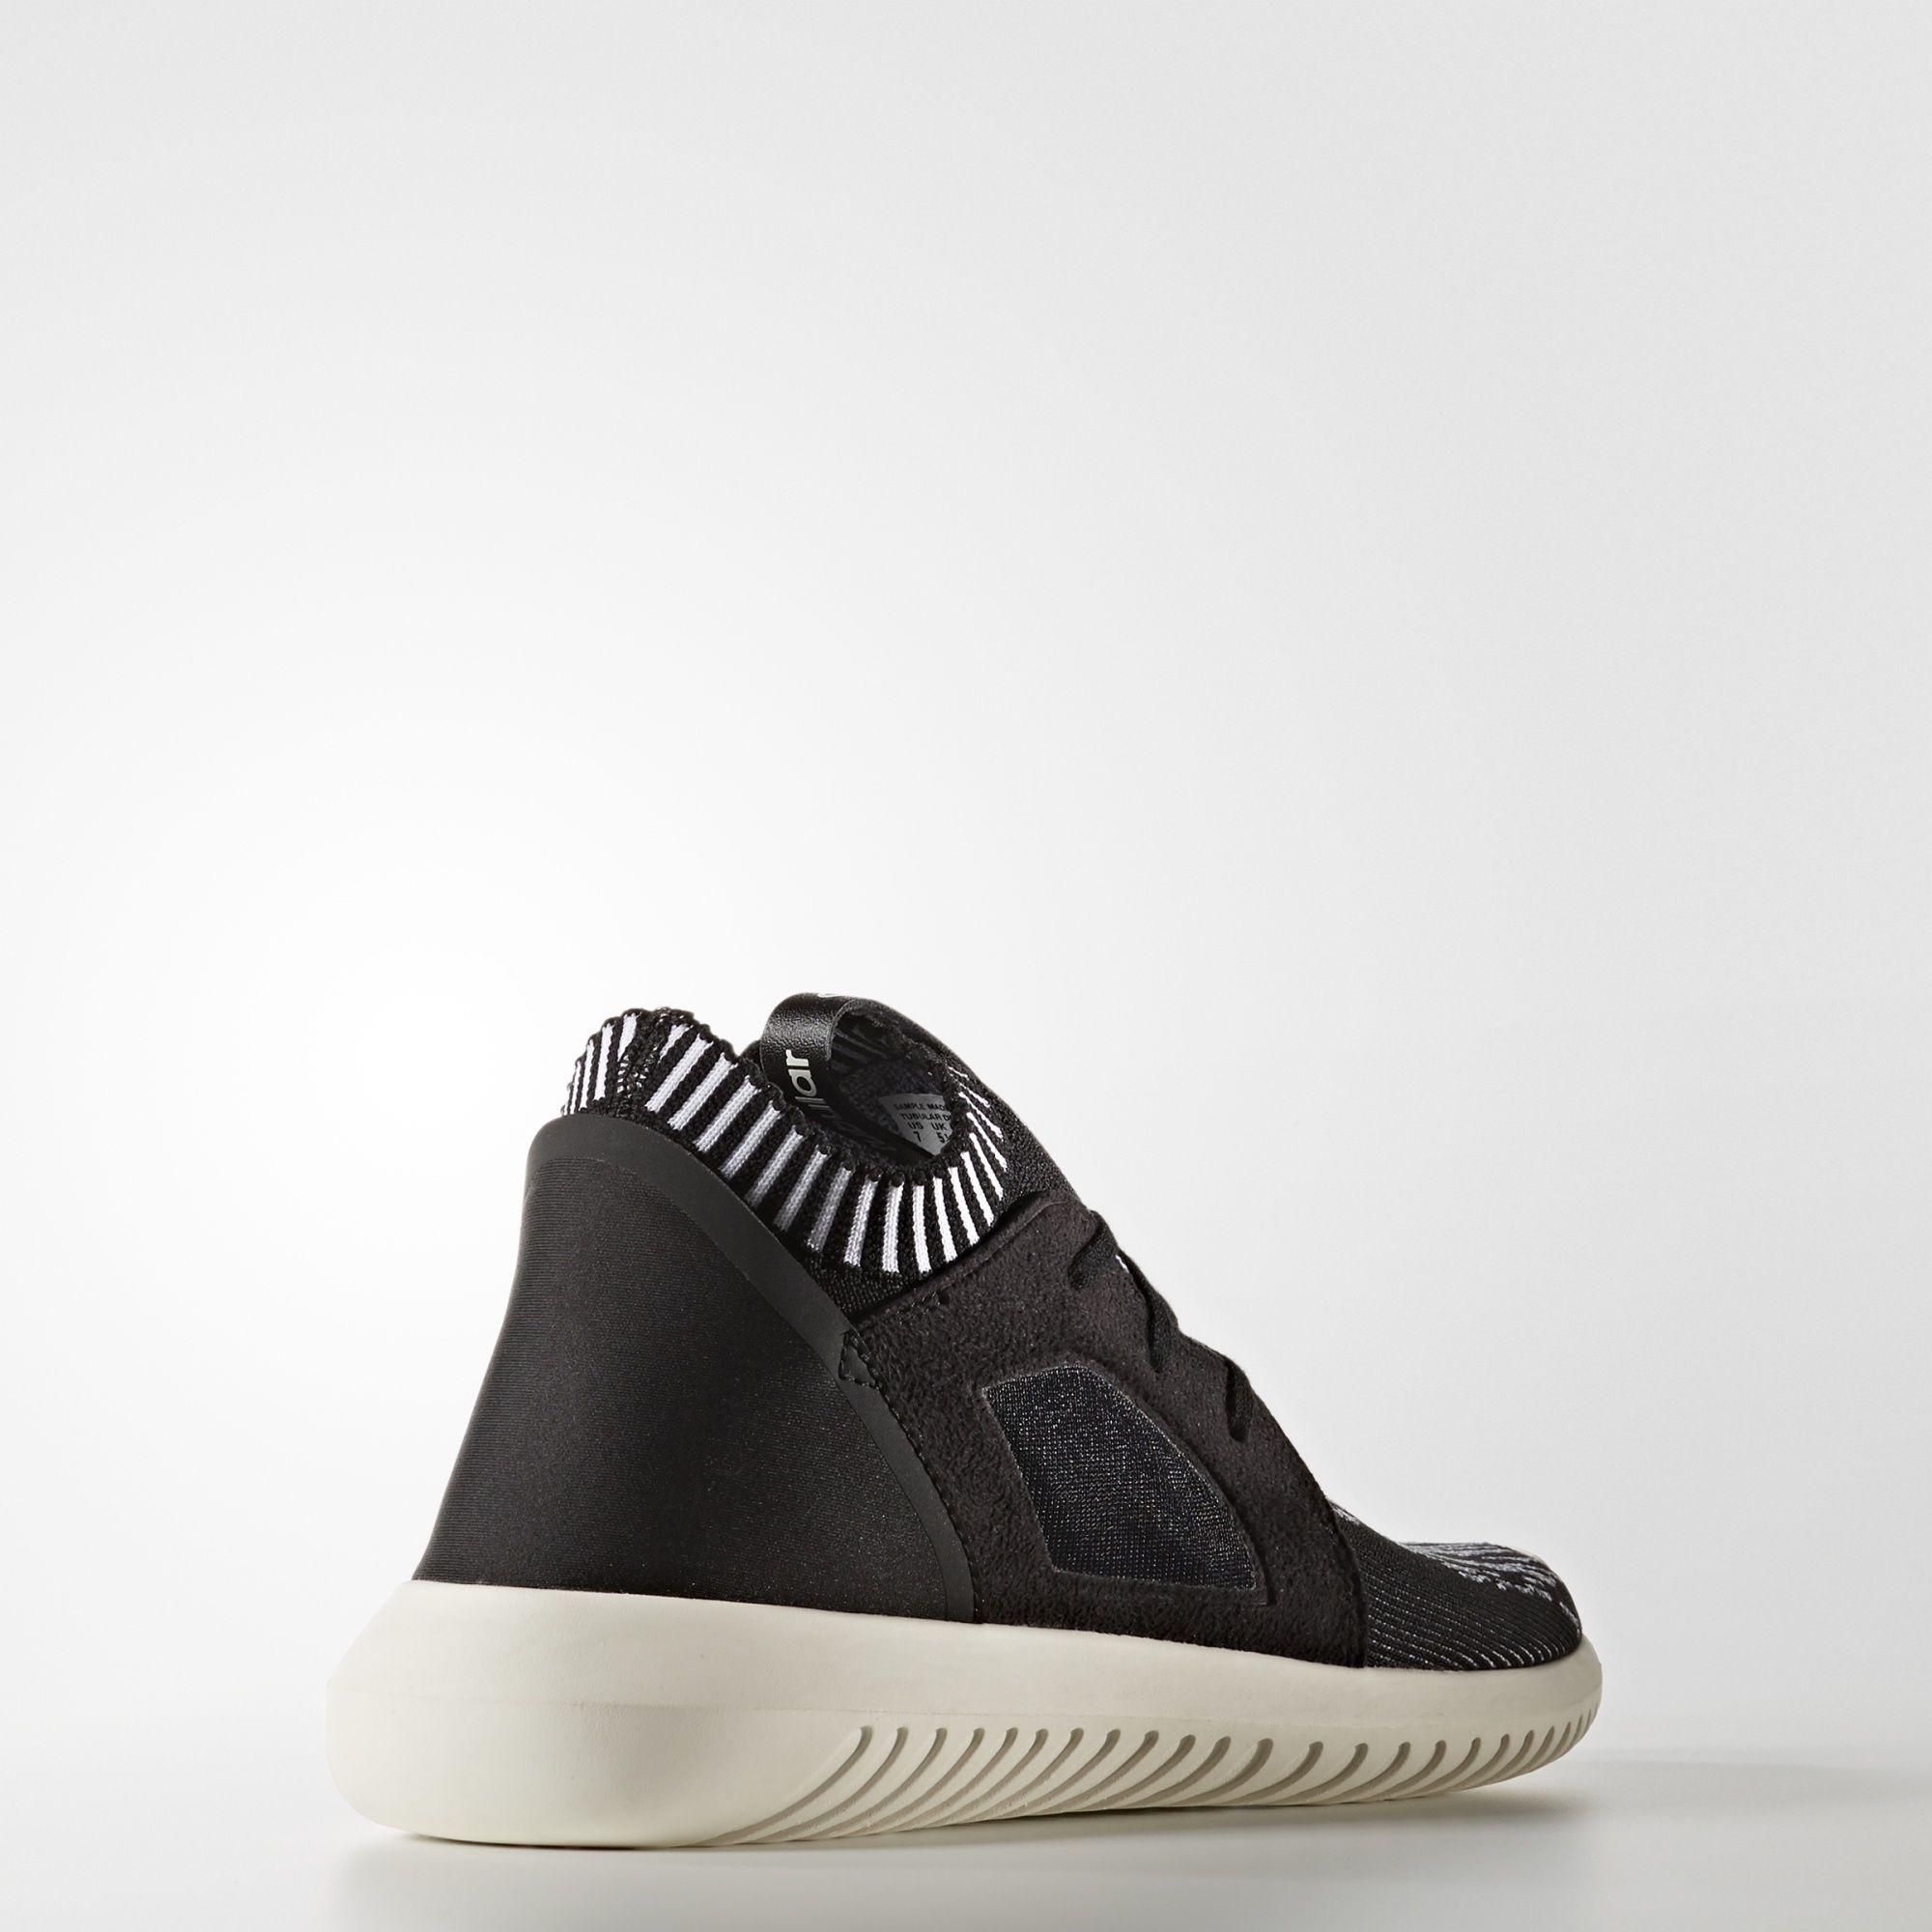 promo code e8736 874f5 adidas - Women s Tubular Defiant Primeknit Shoes